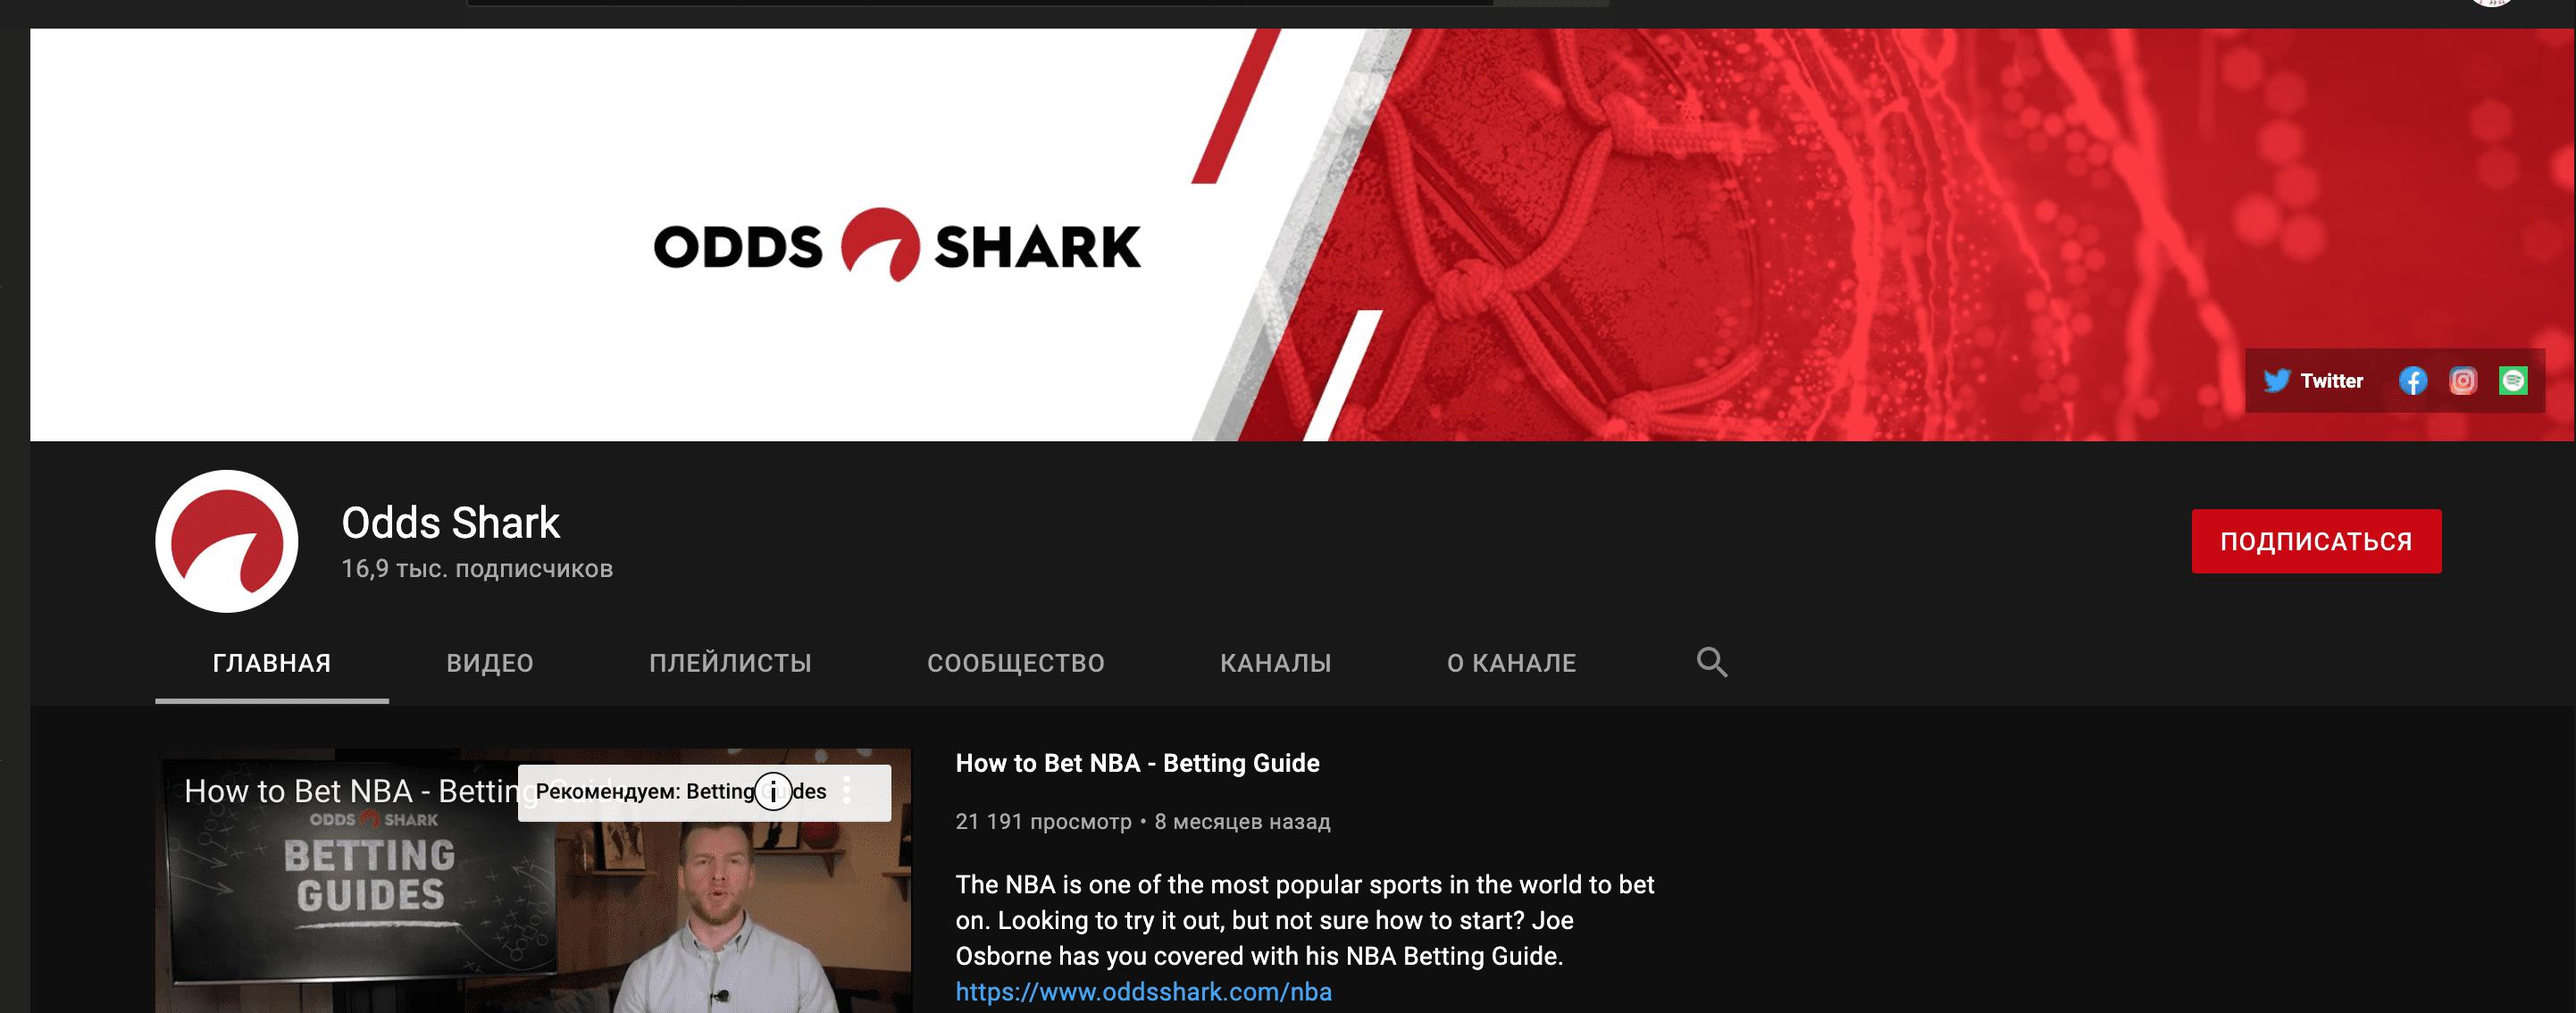 Ютуб канал Oddsshark.com